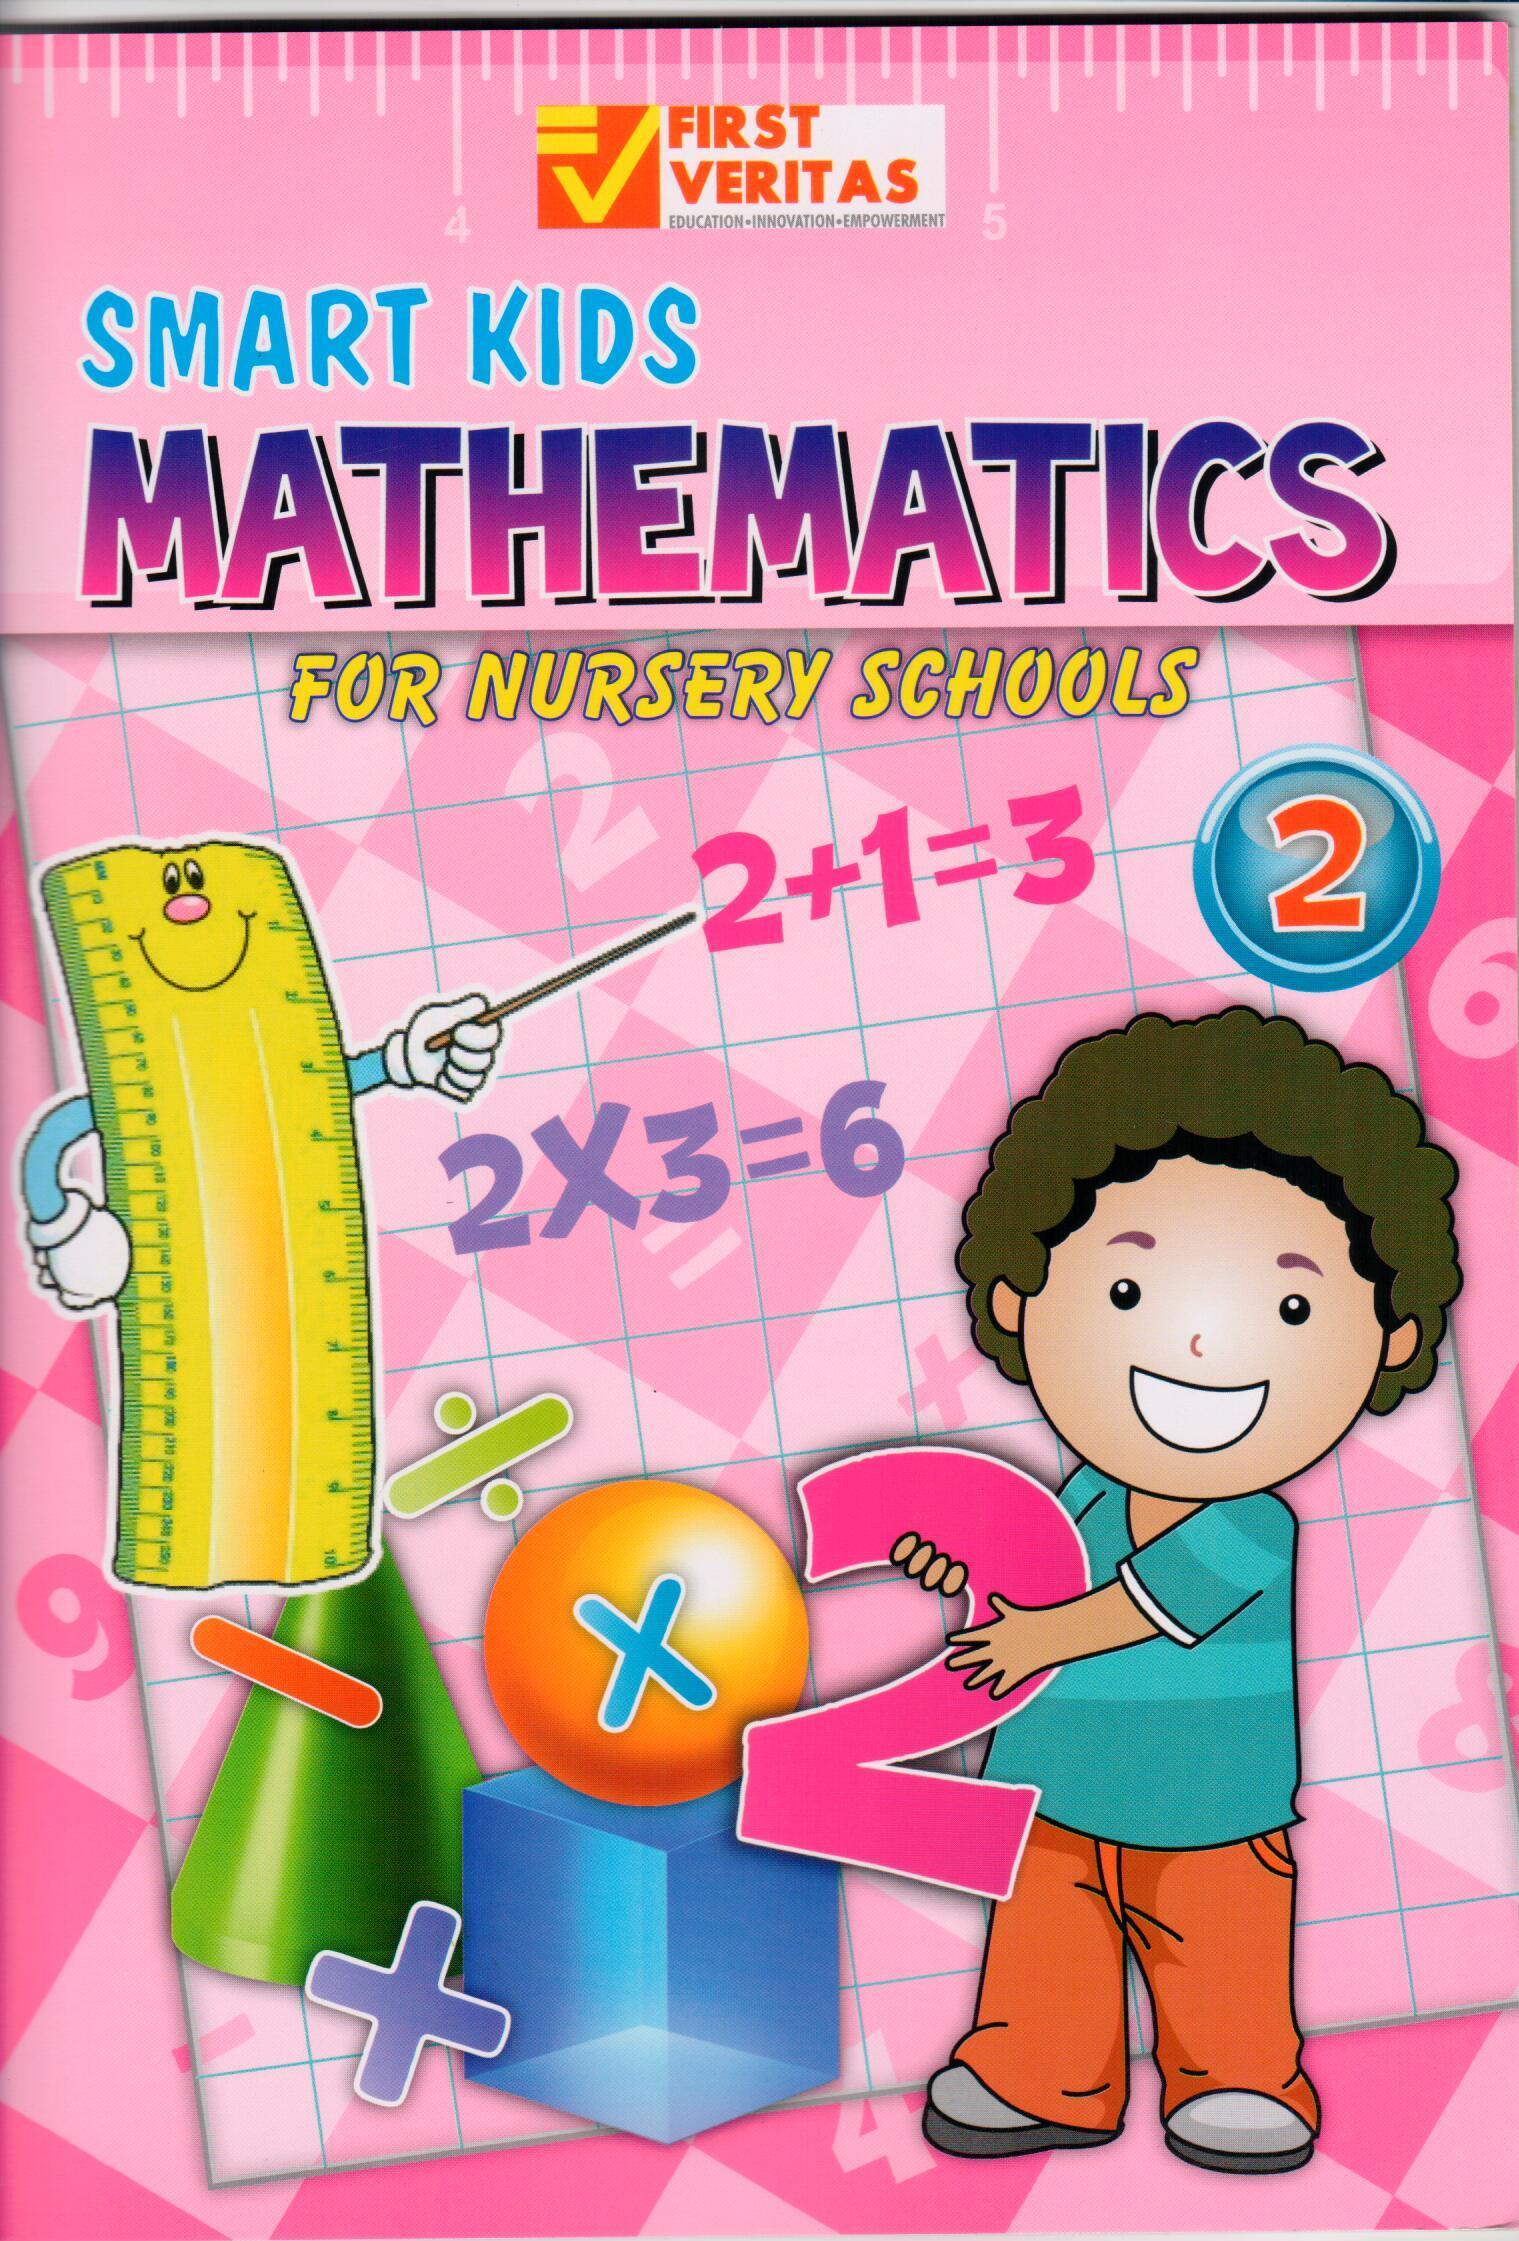 Smart Kids: Mathematics for Nursery School 2 | First Veritas Education